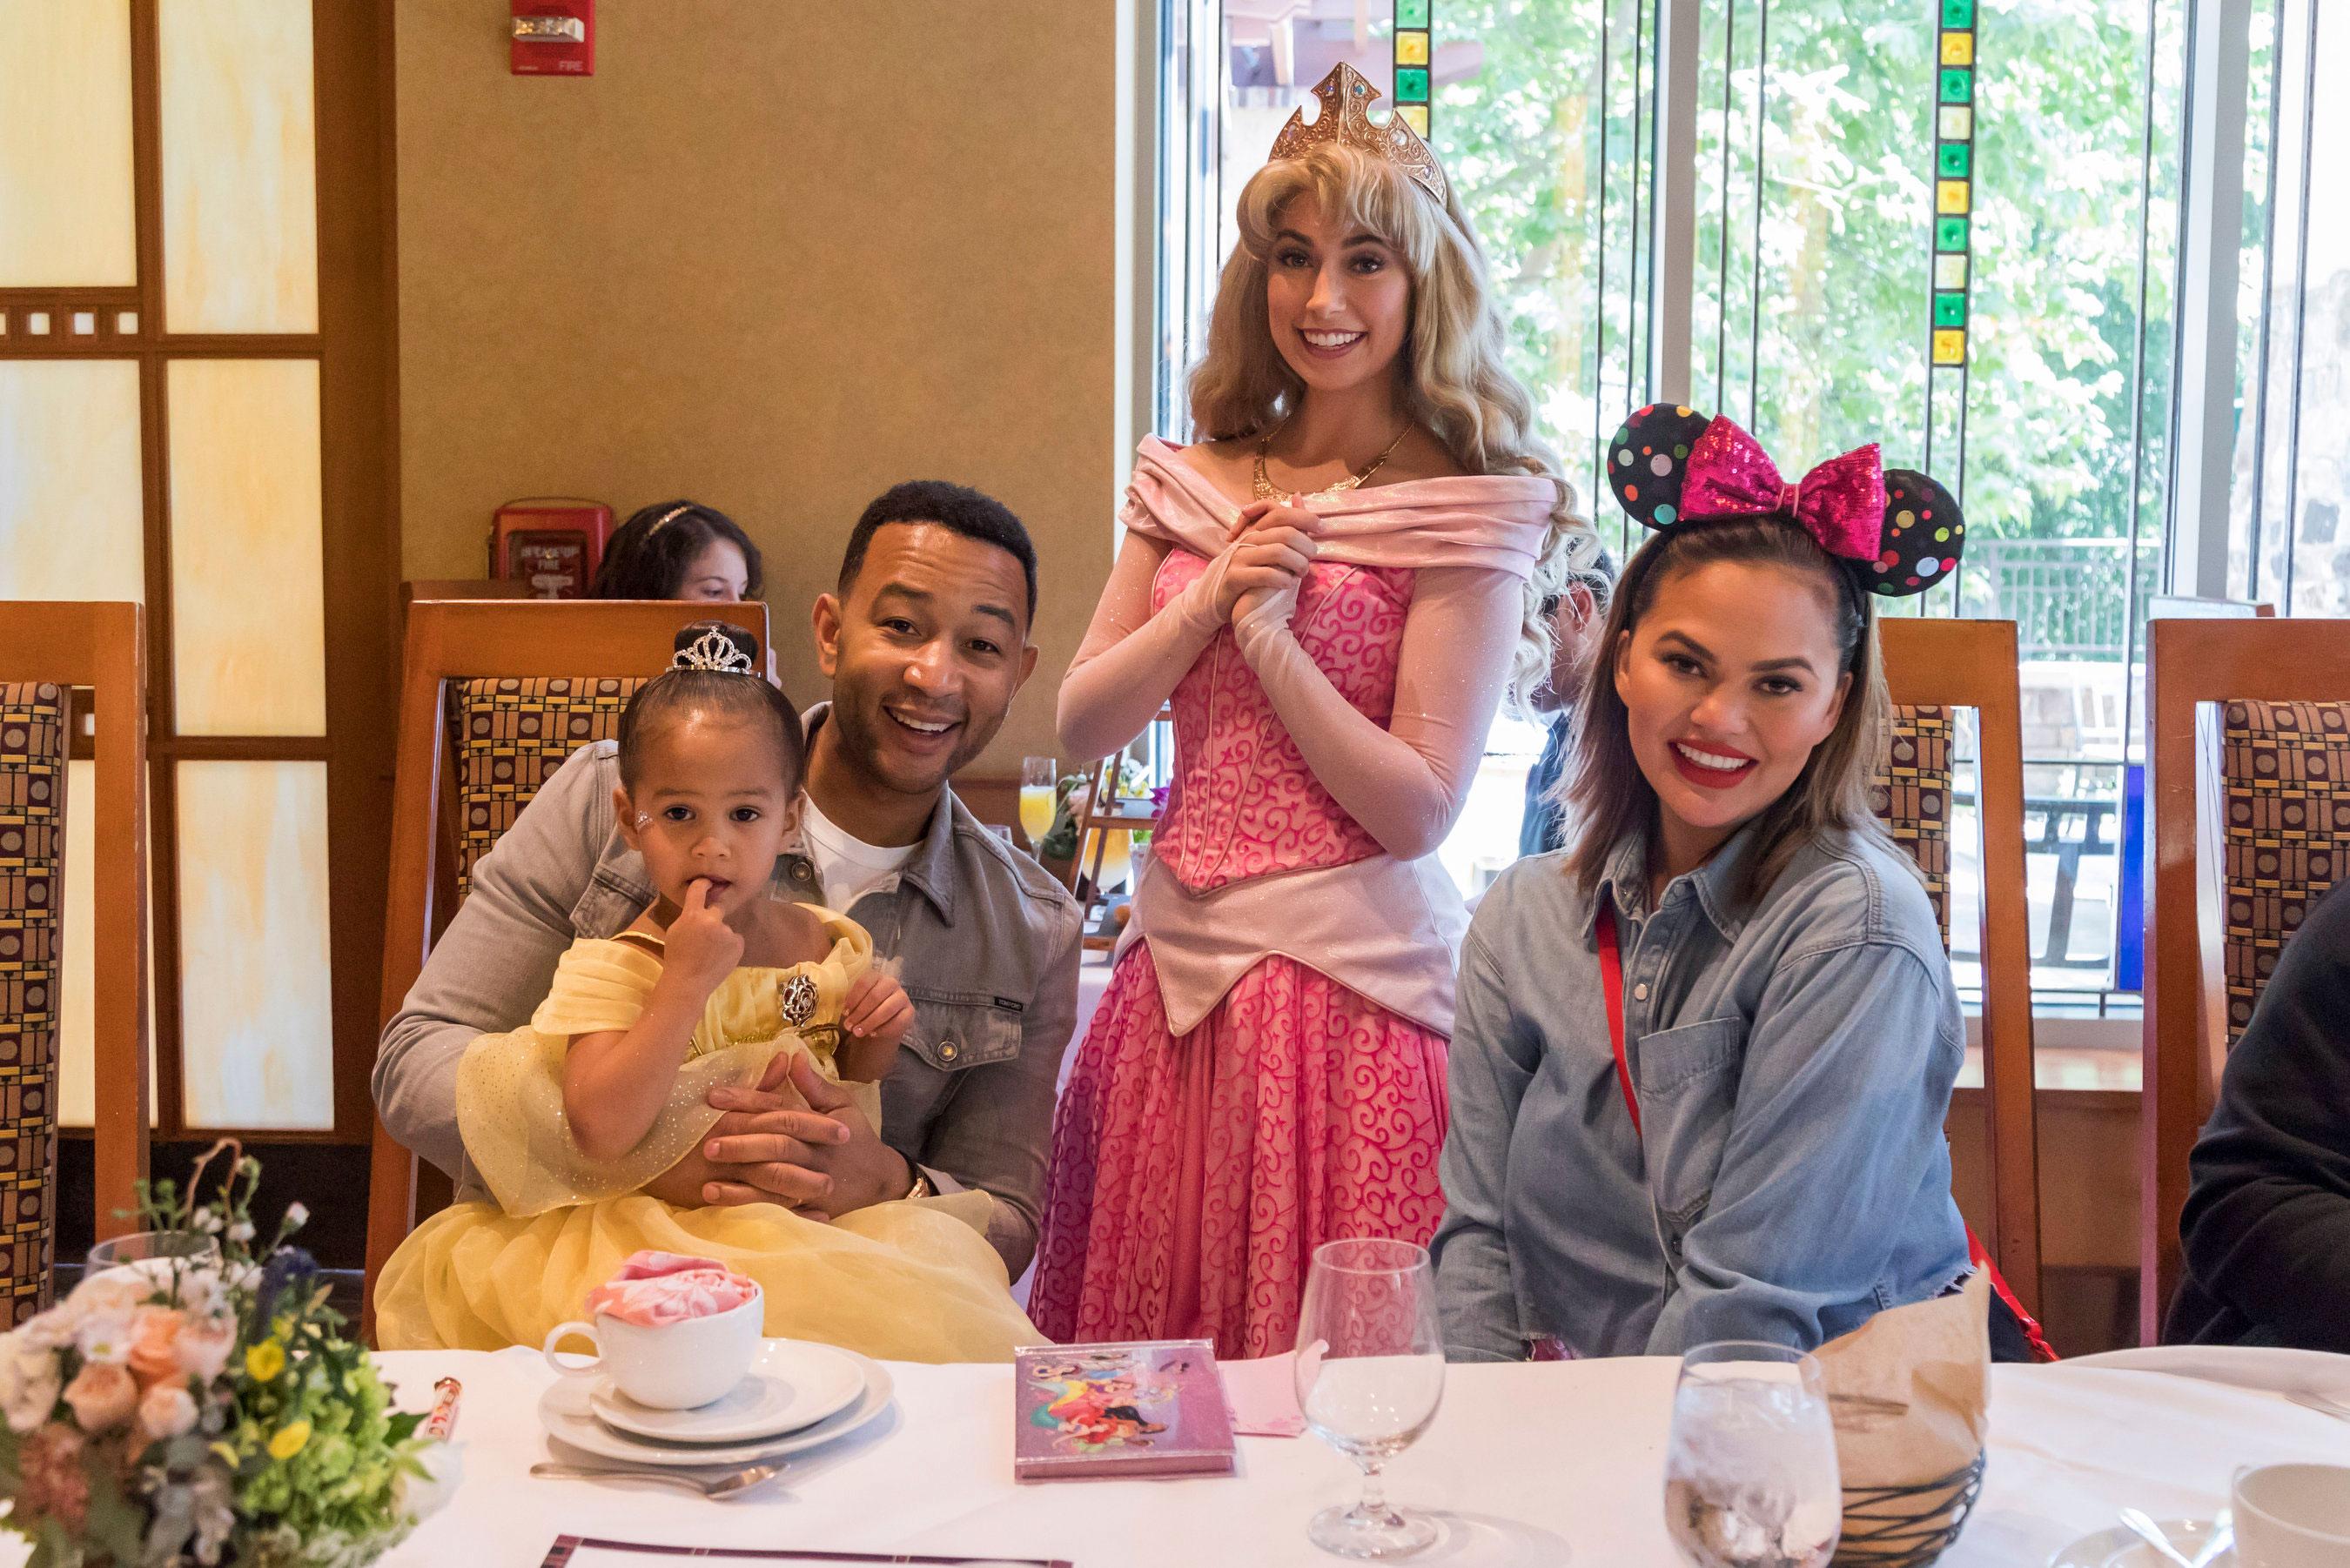 Chrissy Teigen, John Legend Take Luna to Disneyland for 3rd Birthday